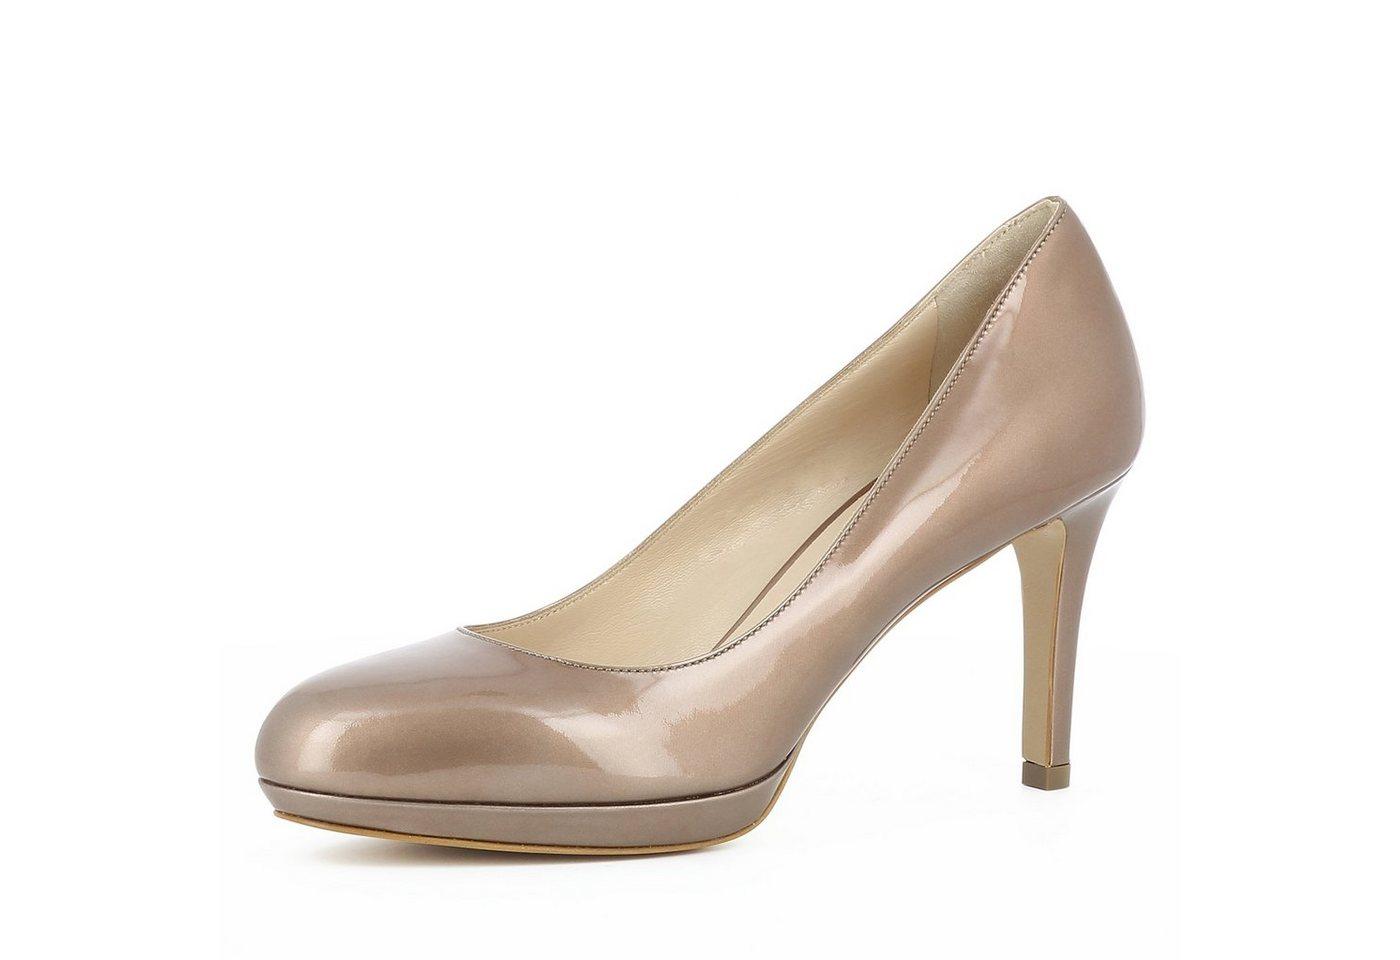 Evita »BIANCA« Plateaupumps | Schuhe > Pumps > Plateaupumps | Gelb | Evita